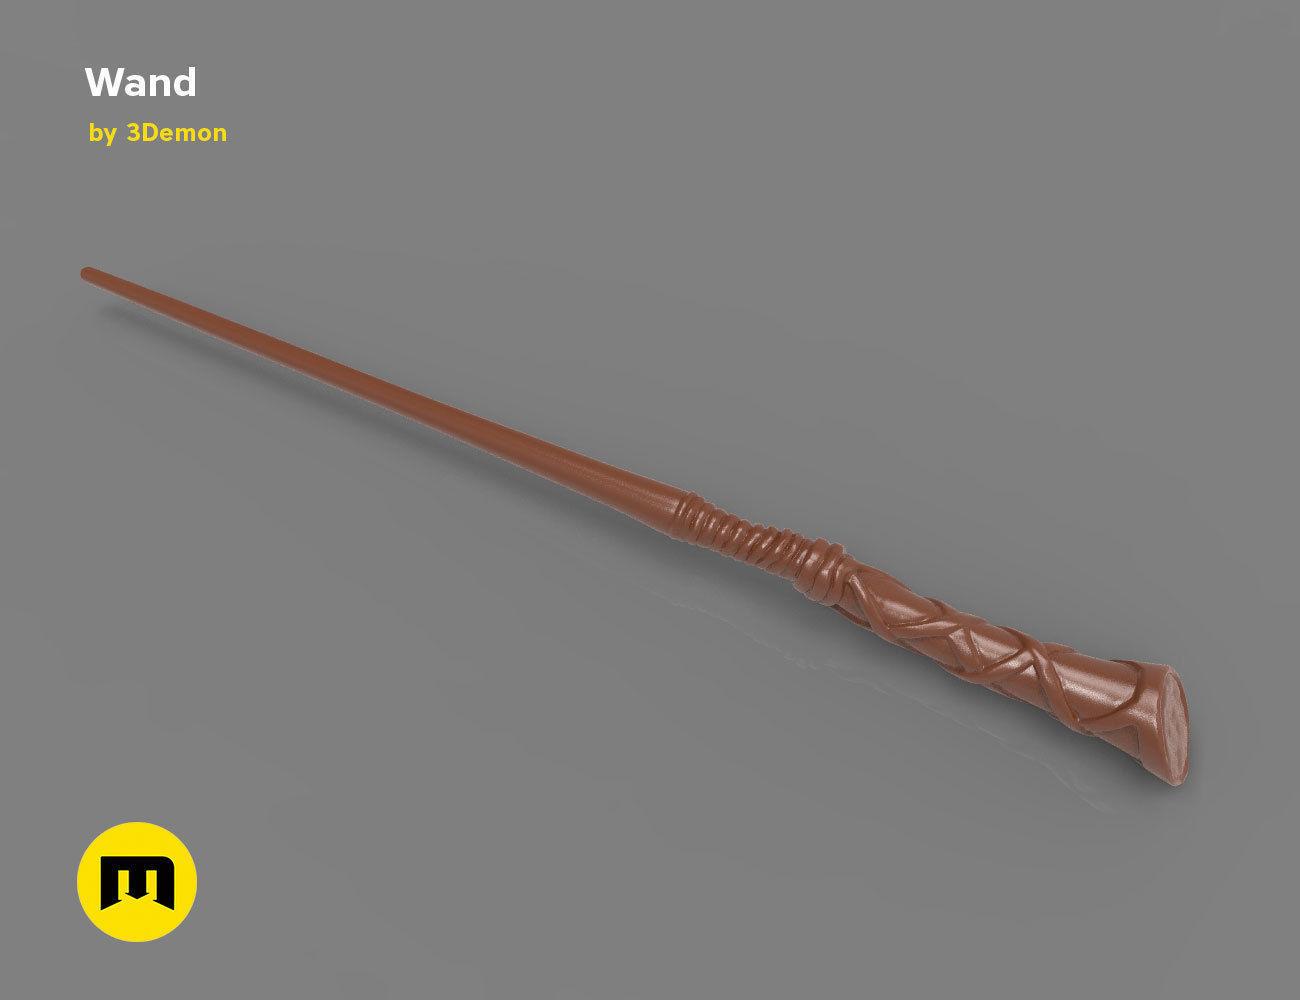 George Weasley Wand - Harry Potter